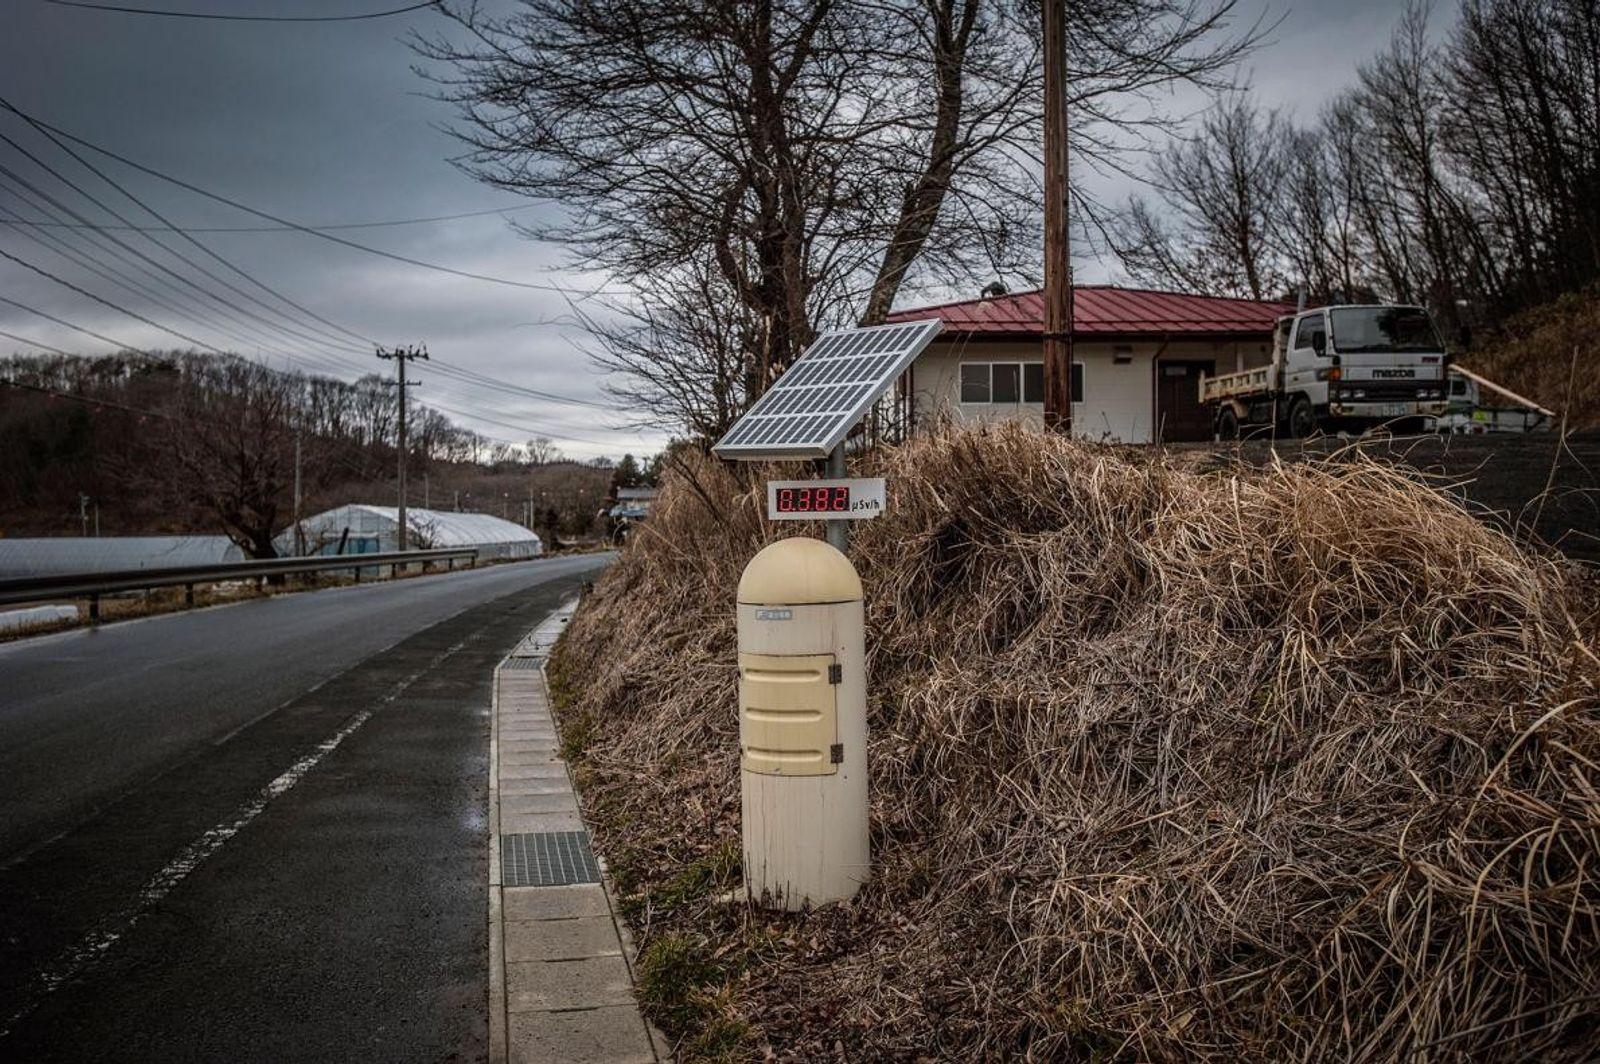 Prefectura de Fukushima abandonada